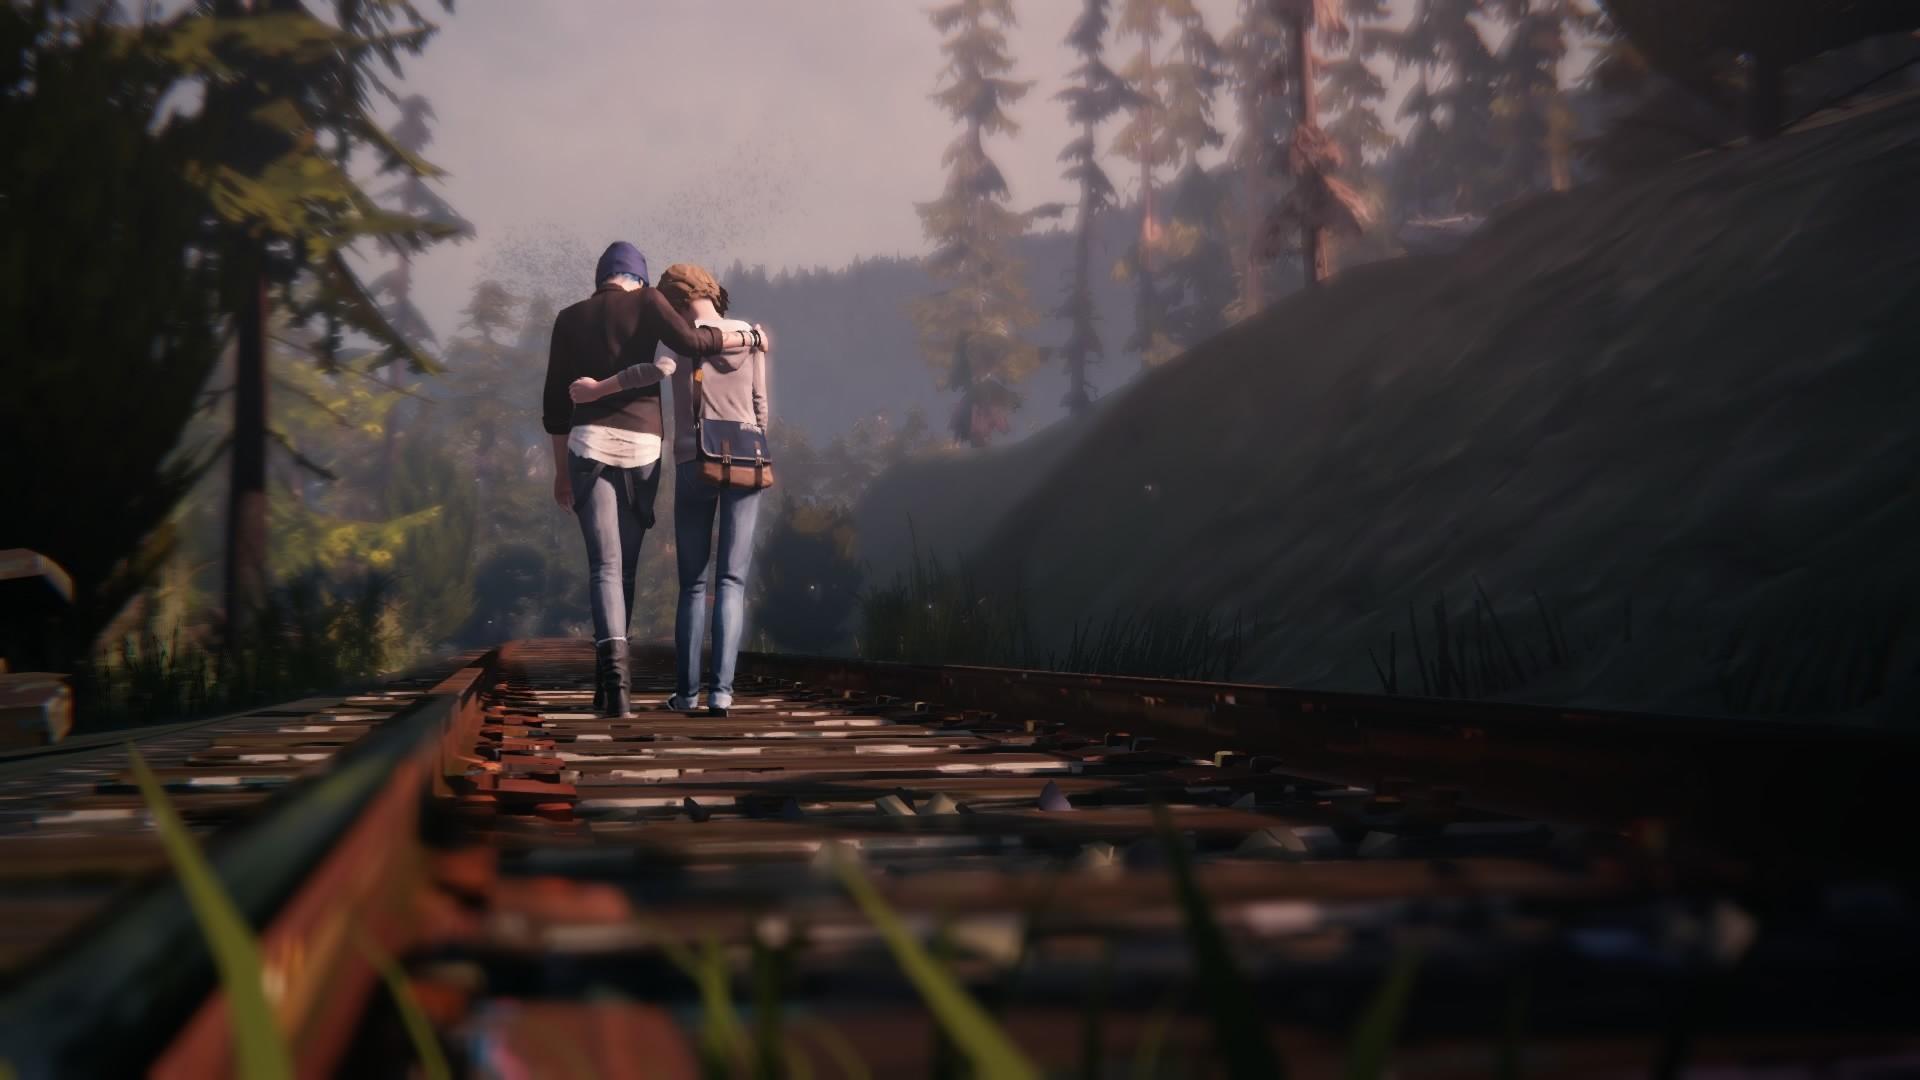 Video Game – Life Is Strange Max Caulfield Chloe Price Wallpaper